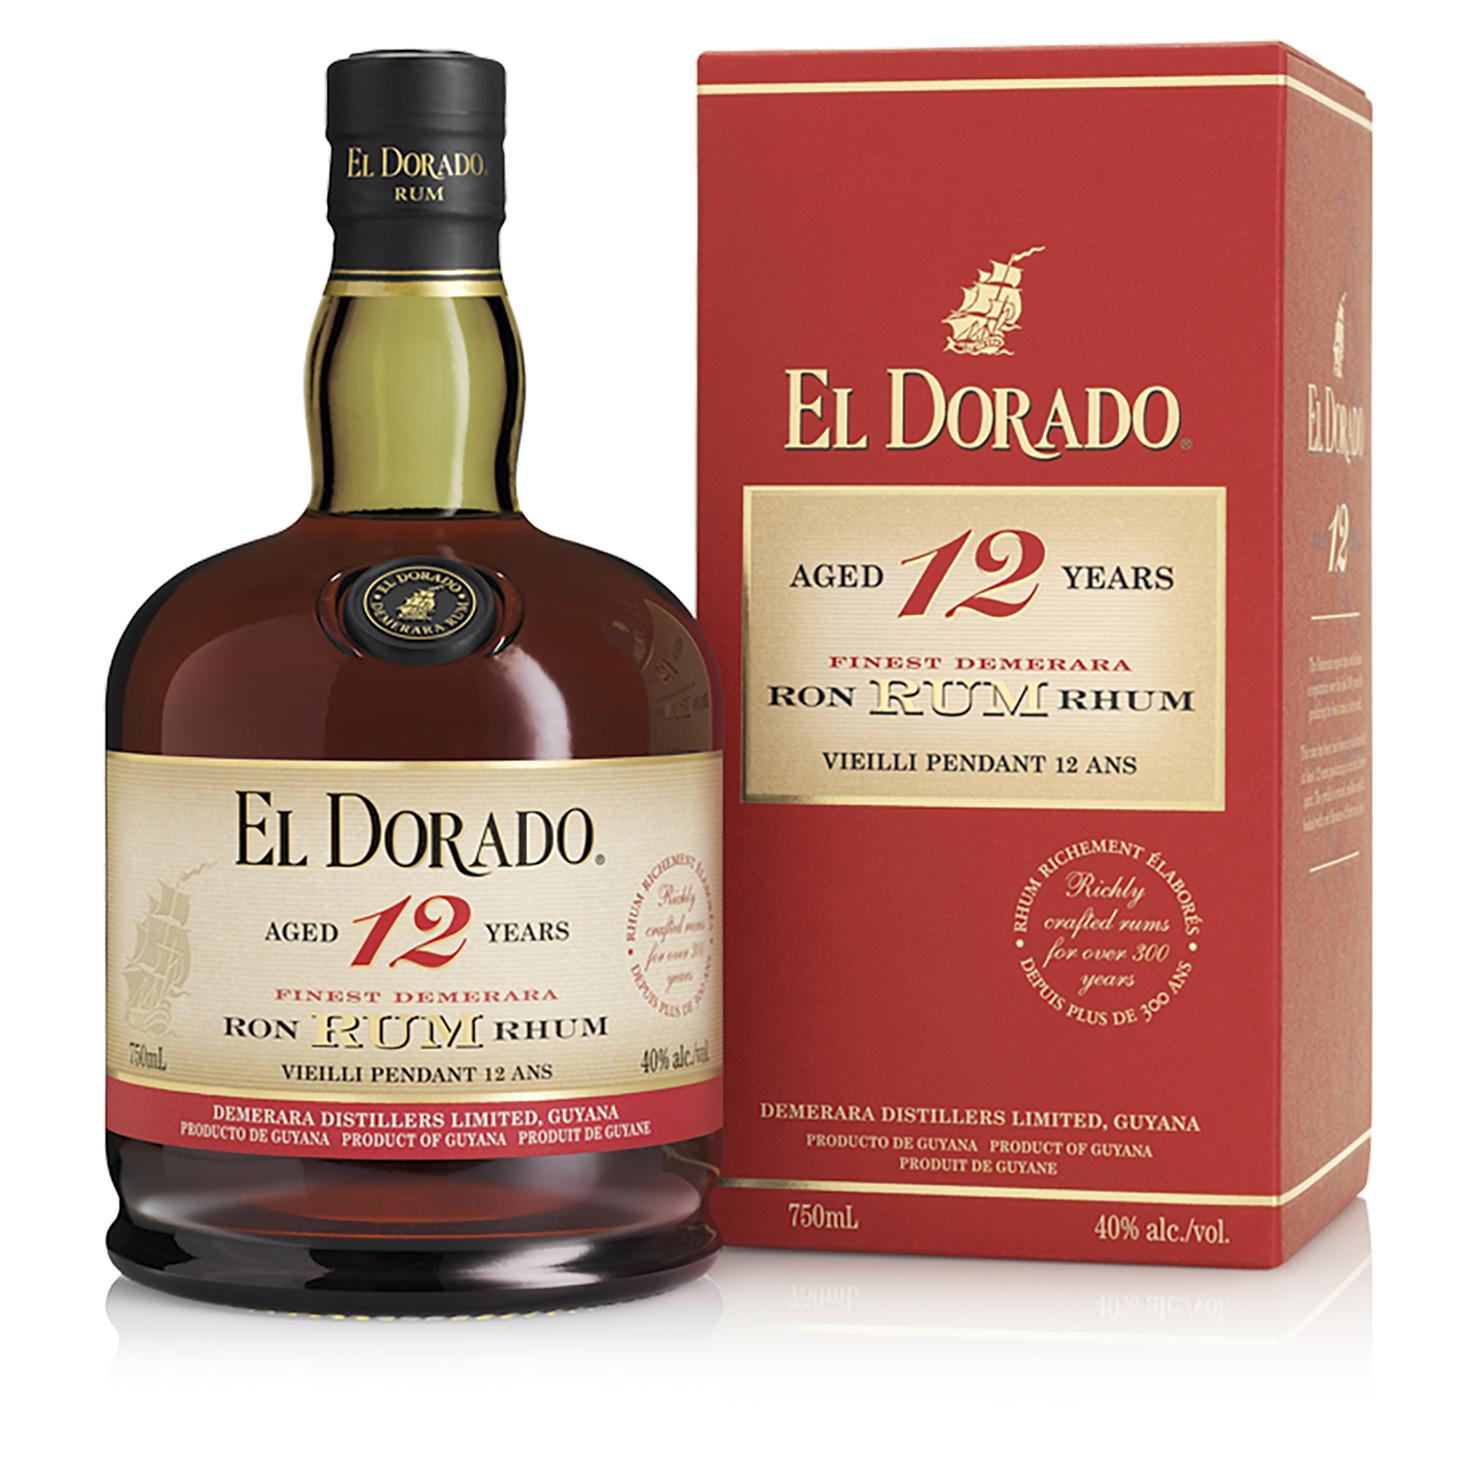 Rhum - El Dorado 12 ans - Guyane Anglaise - 70cl - 40°